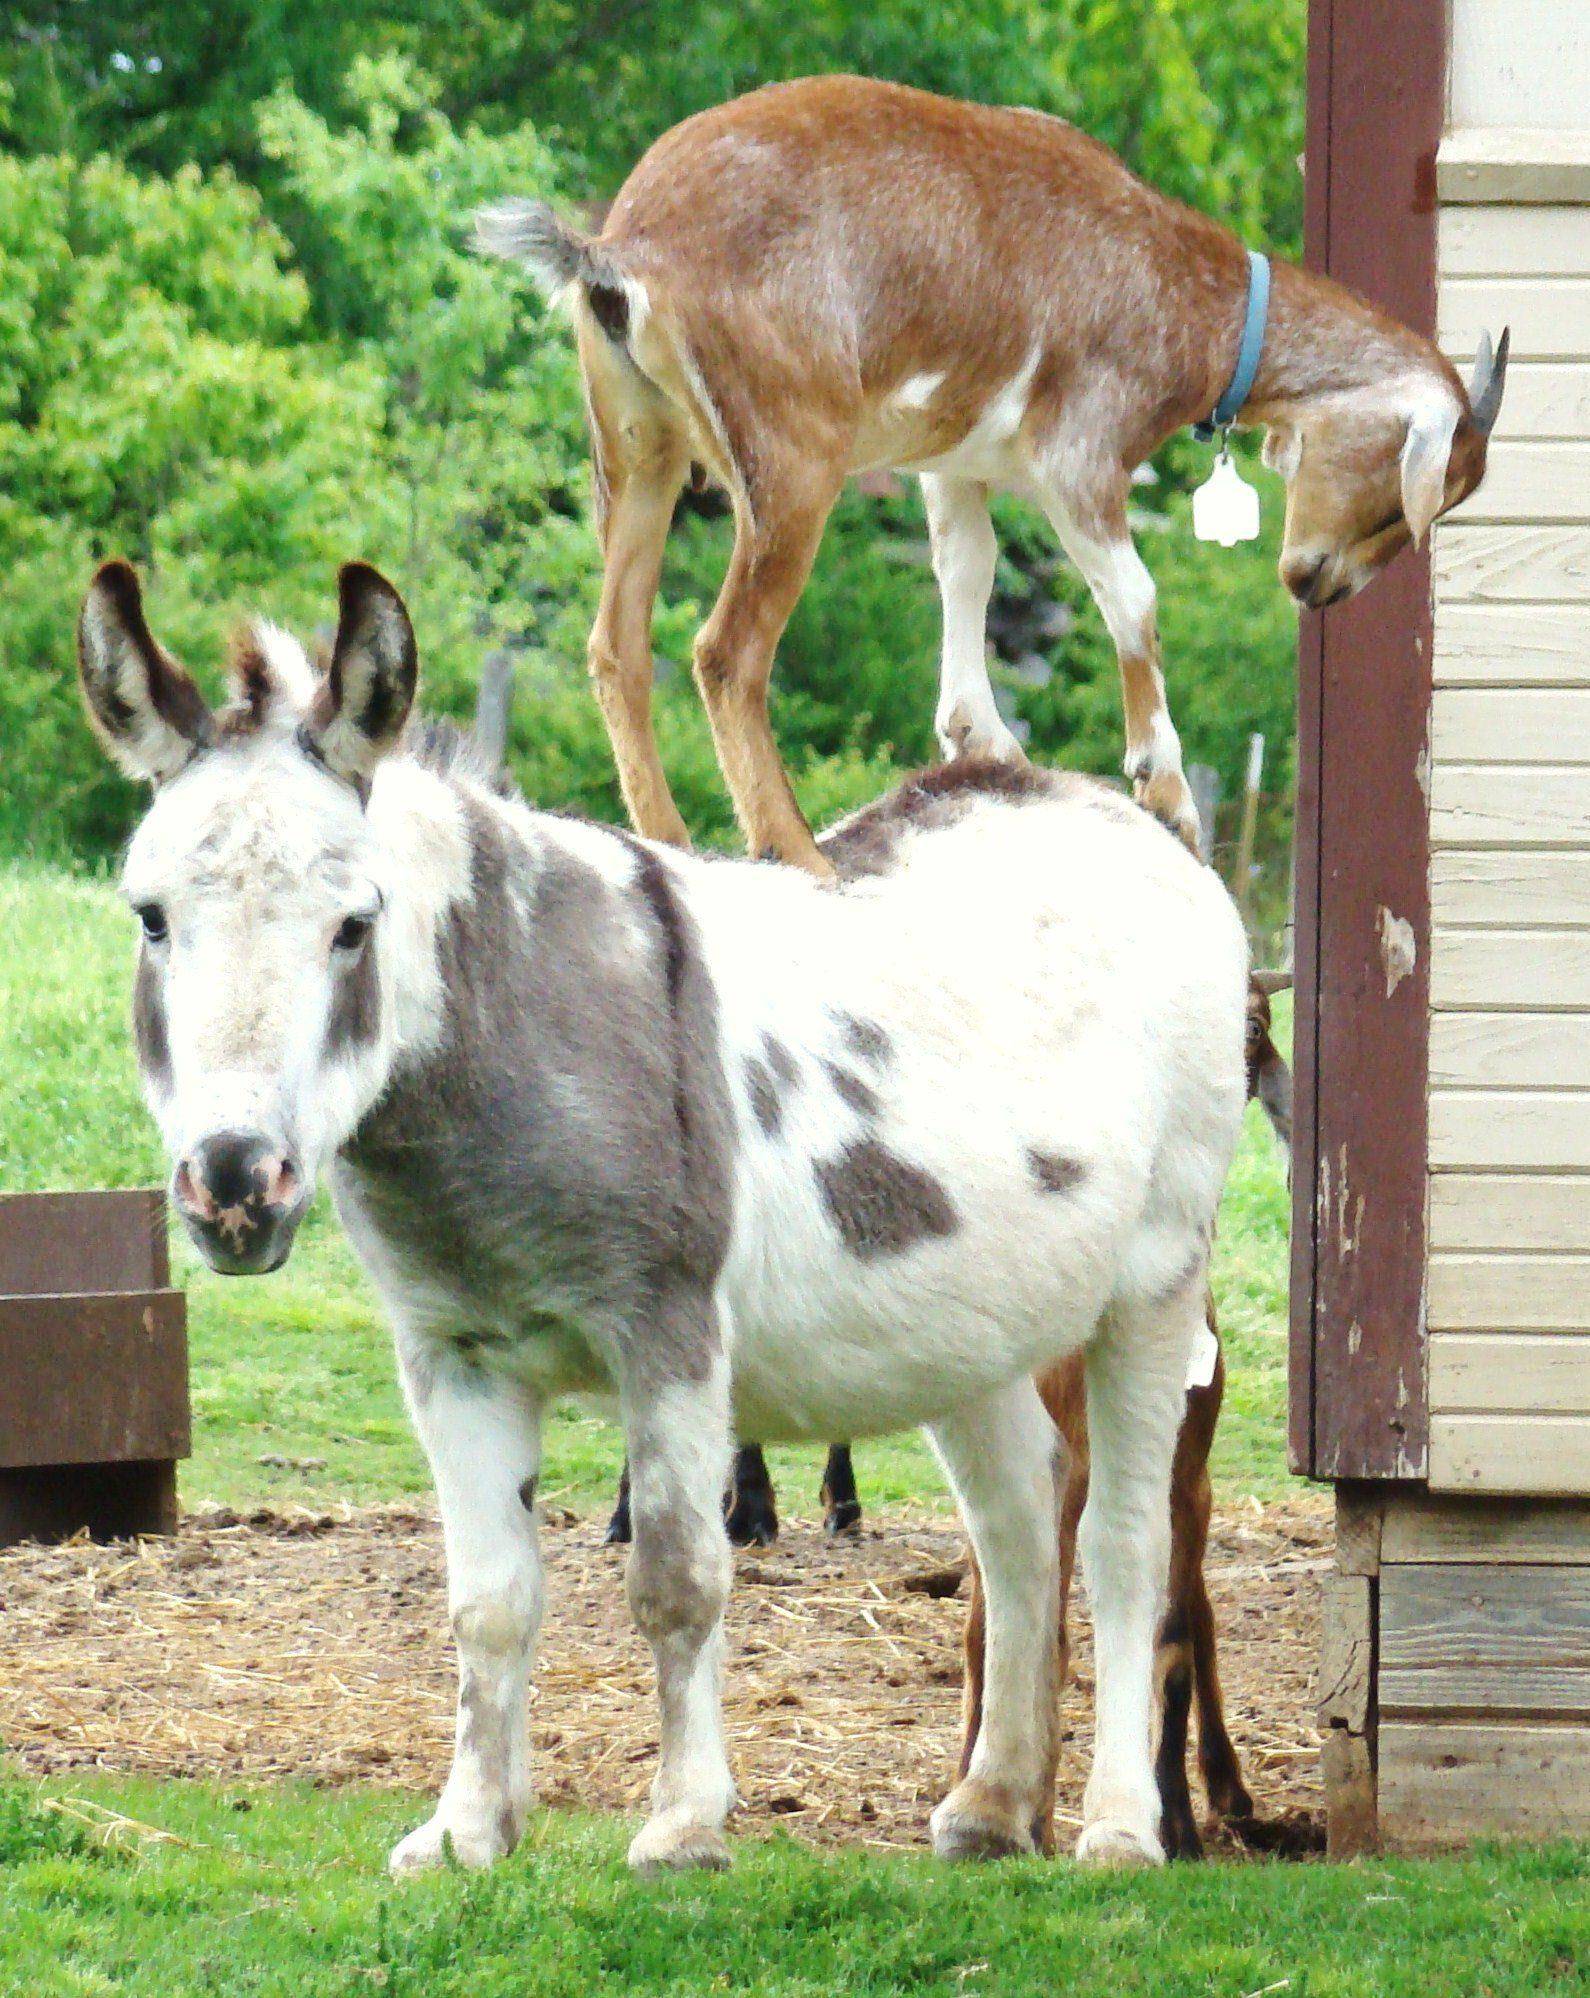 hitchhiking goat